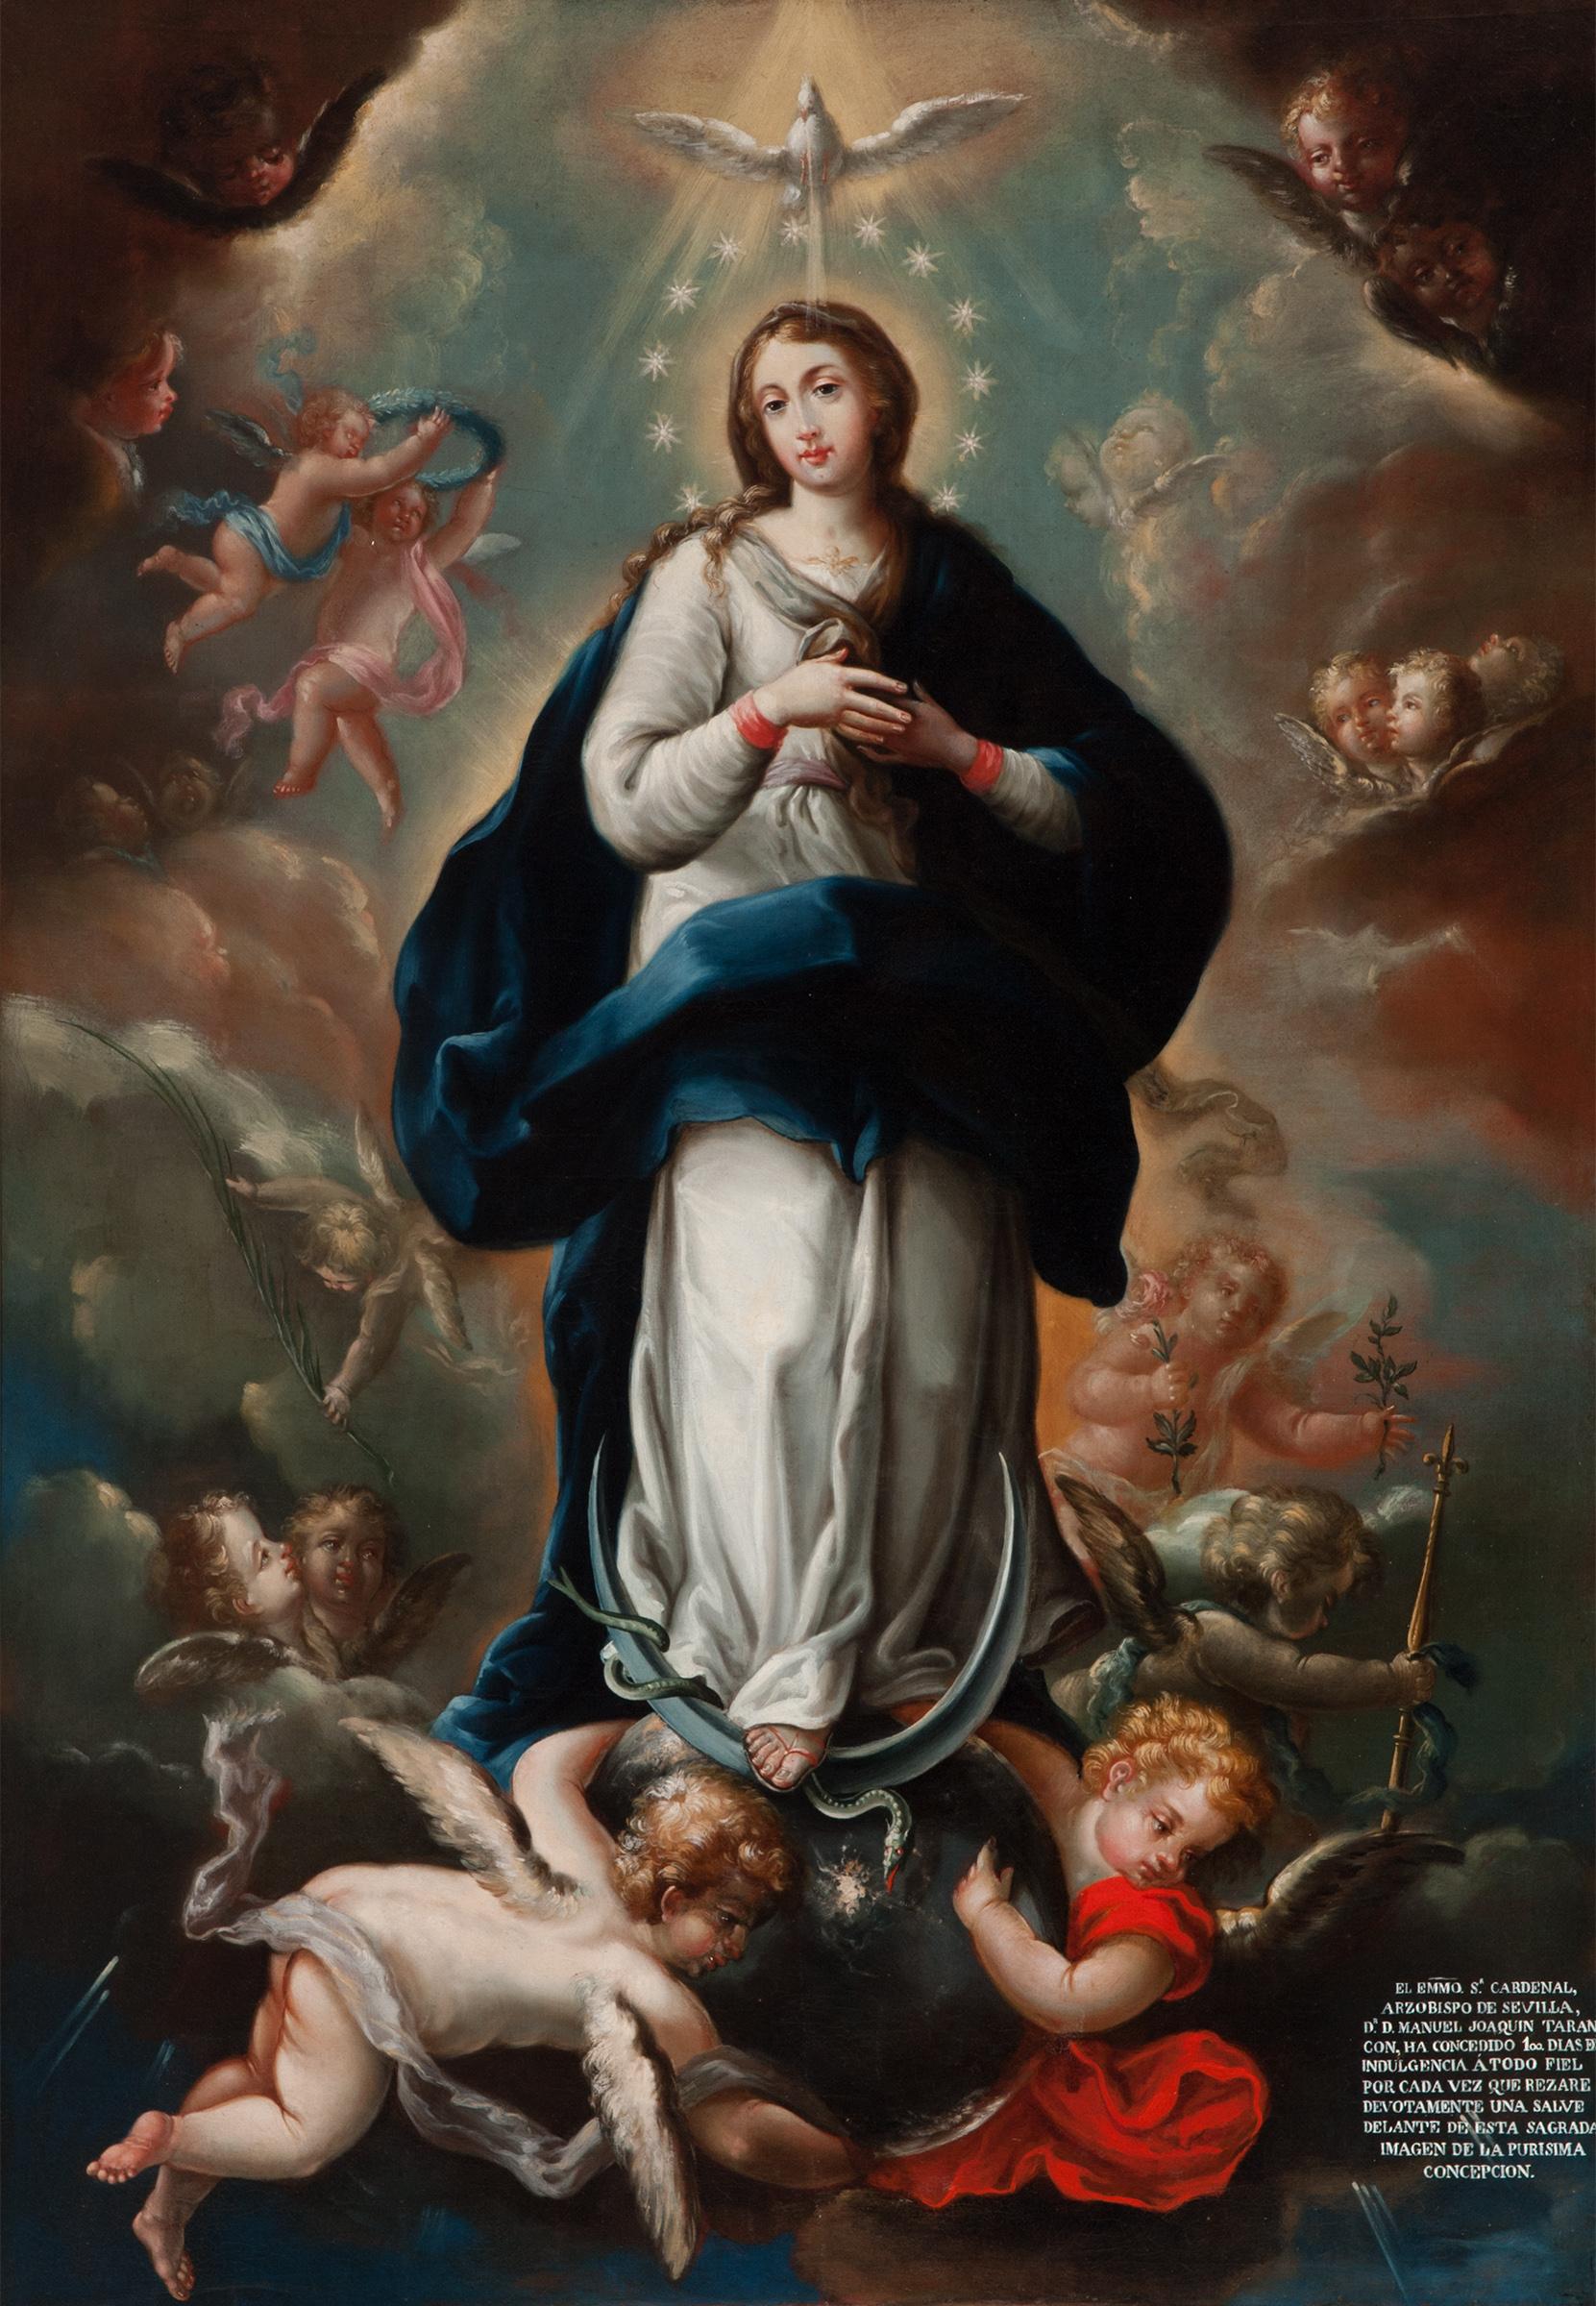 Atribuido a Isidoro de Tapia – Inmaculada